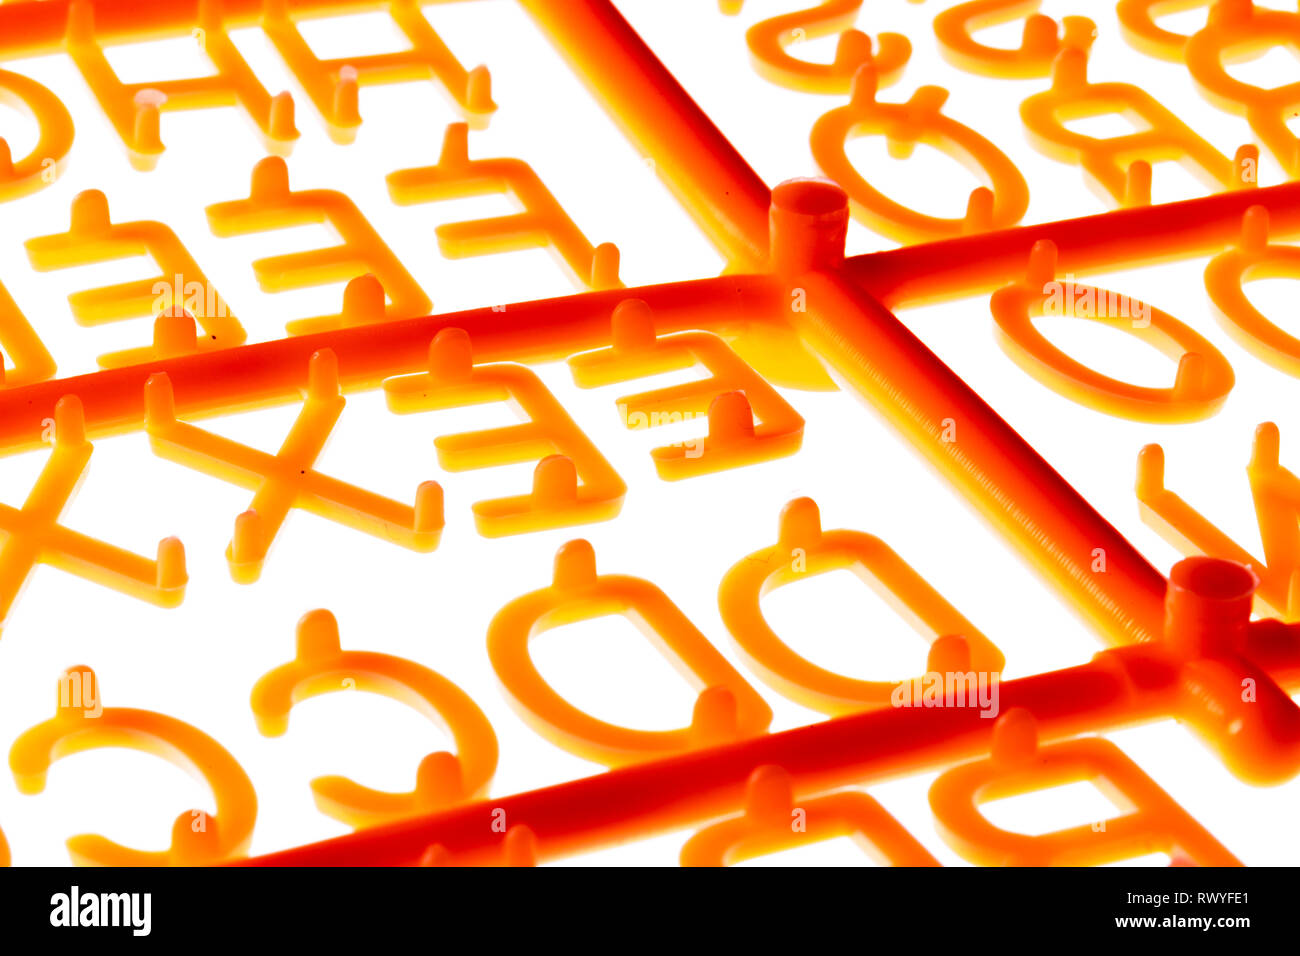 Buchstaben, an einem Gussstrang, zum betexten einer Texttafel, - Stock Image